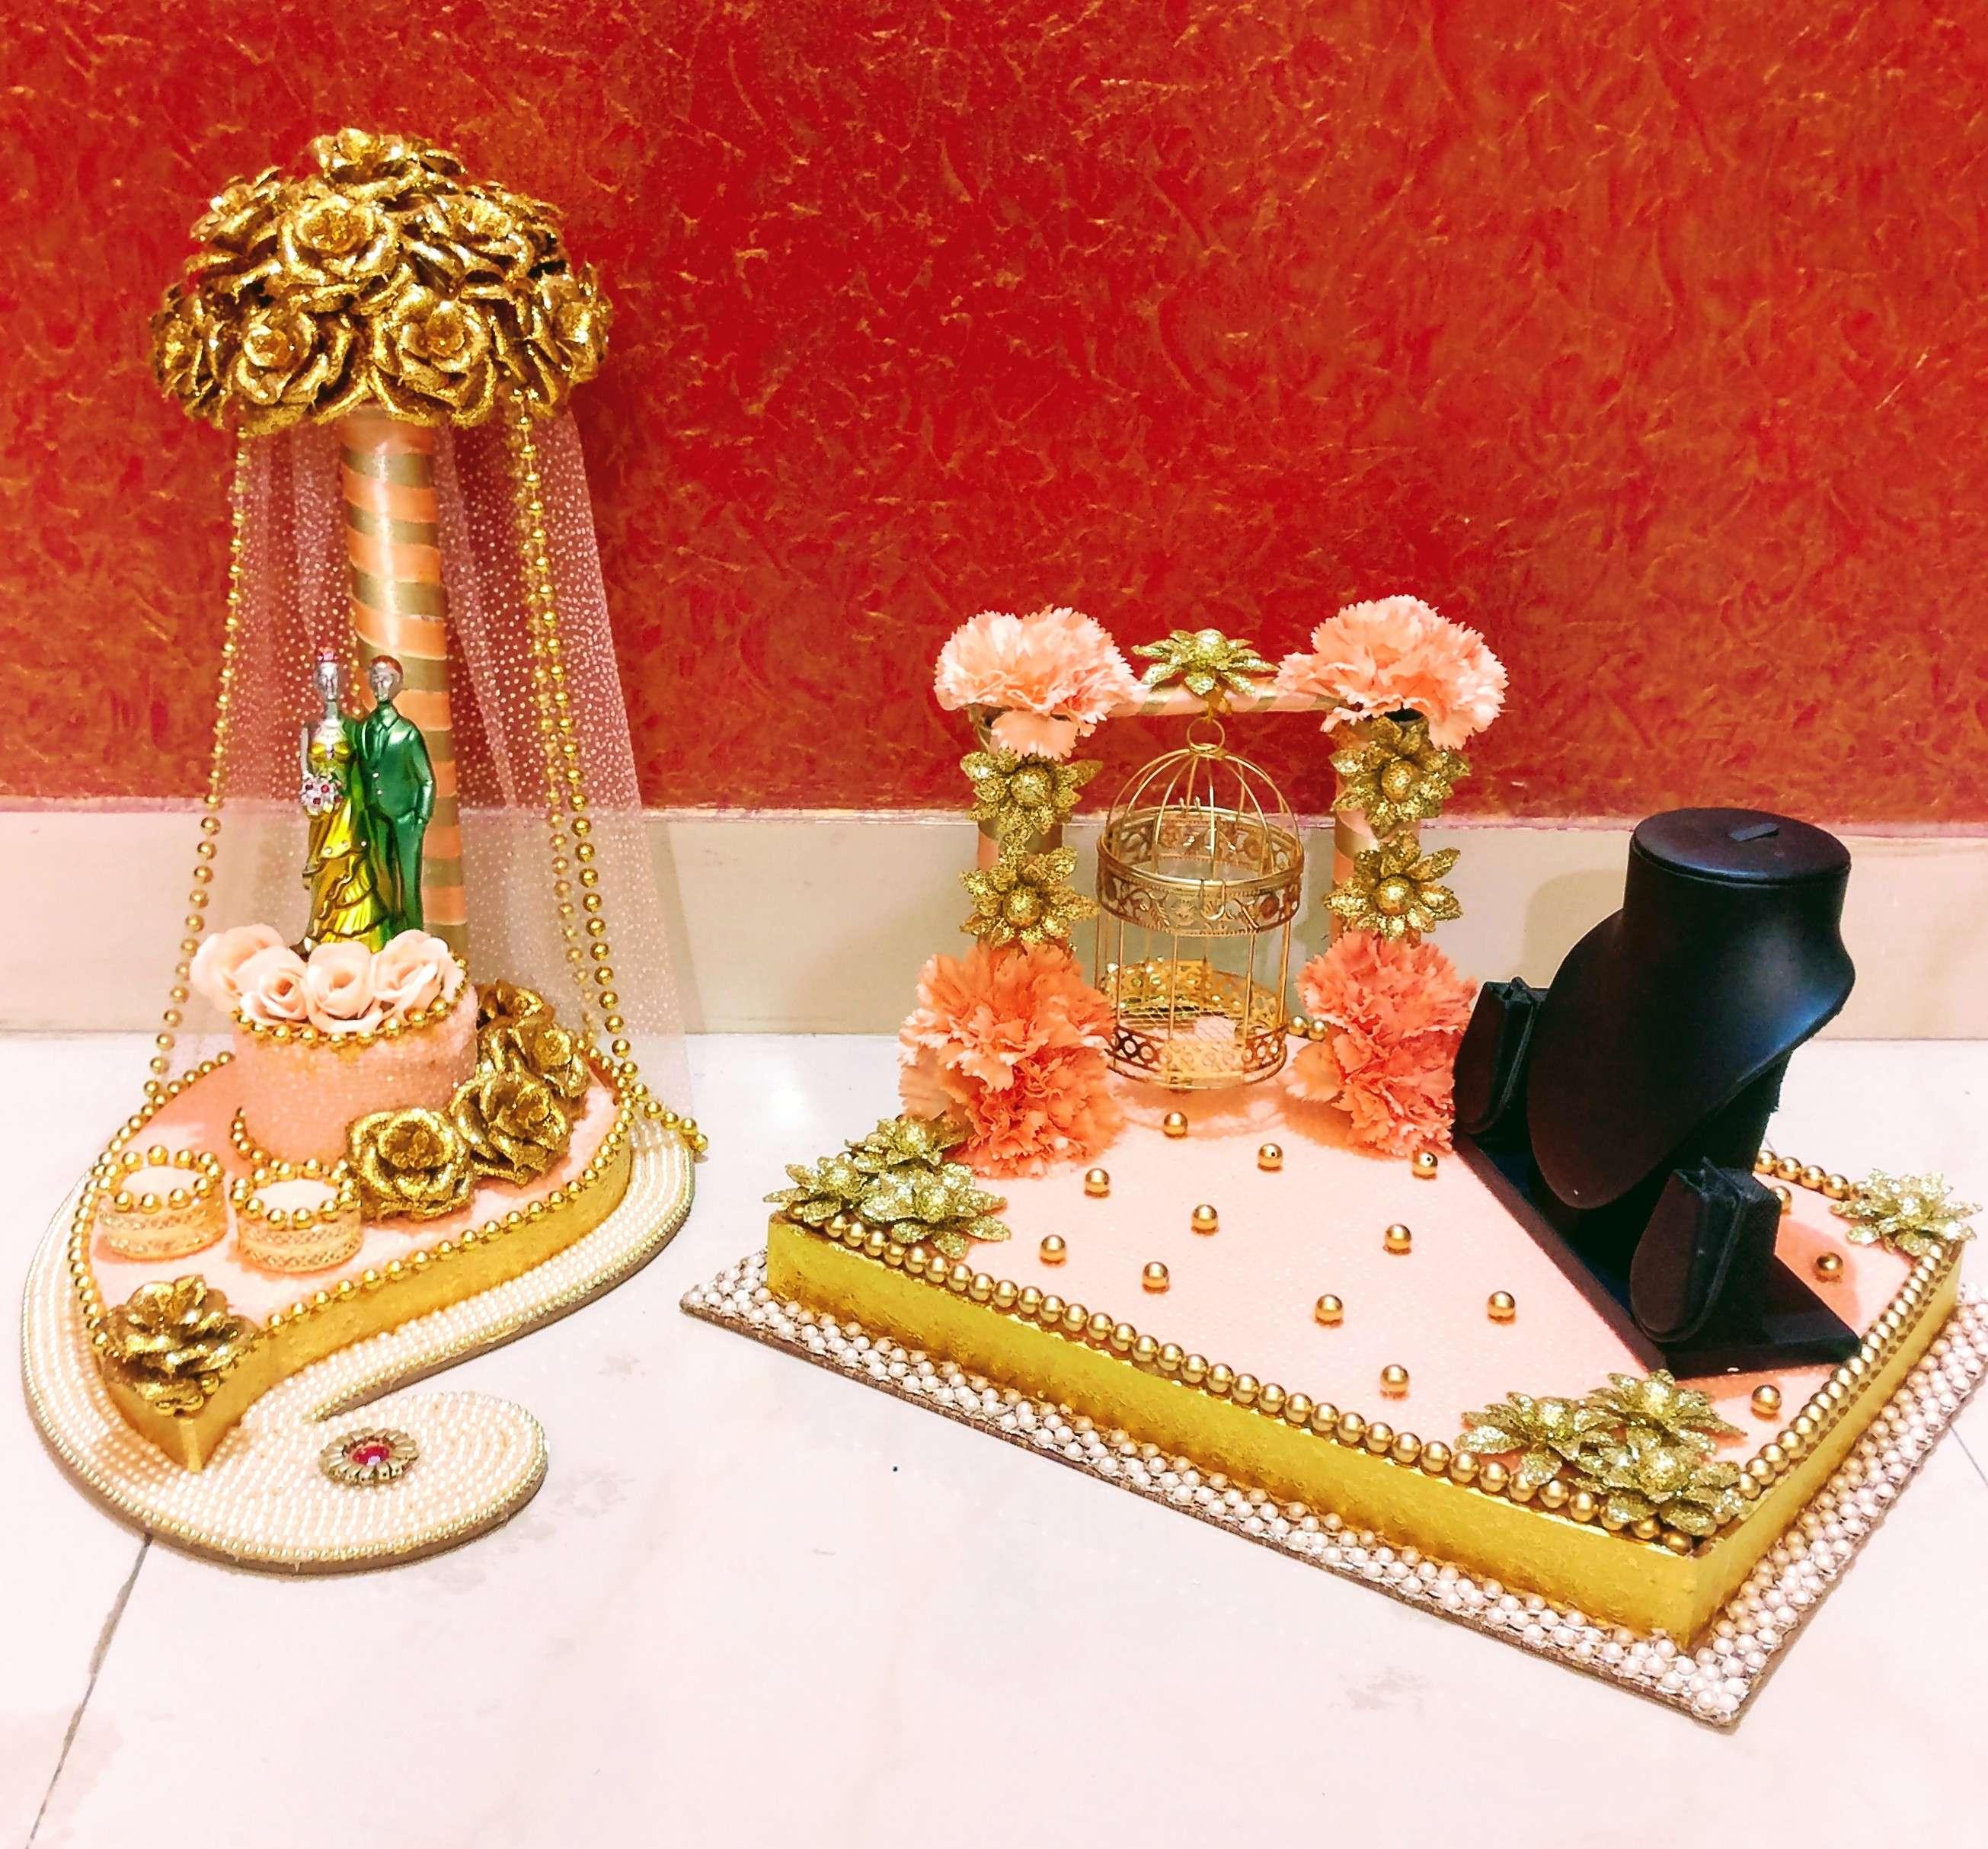 Glitterzz Creatio Engagement Ring Platter Shaadiwish